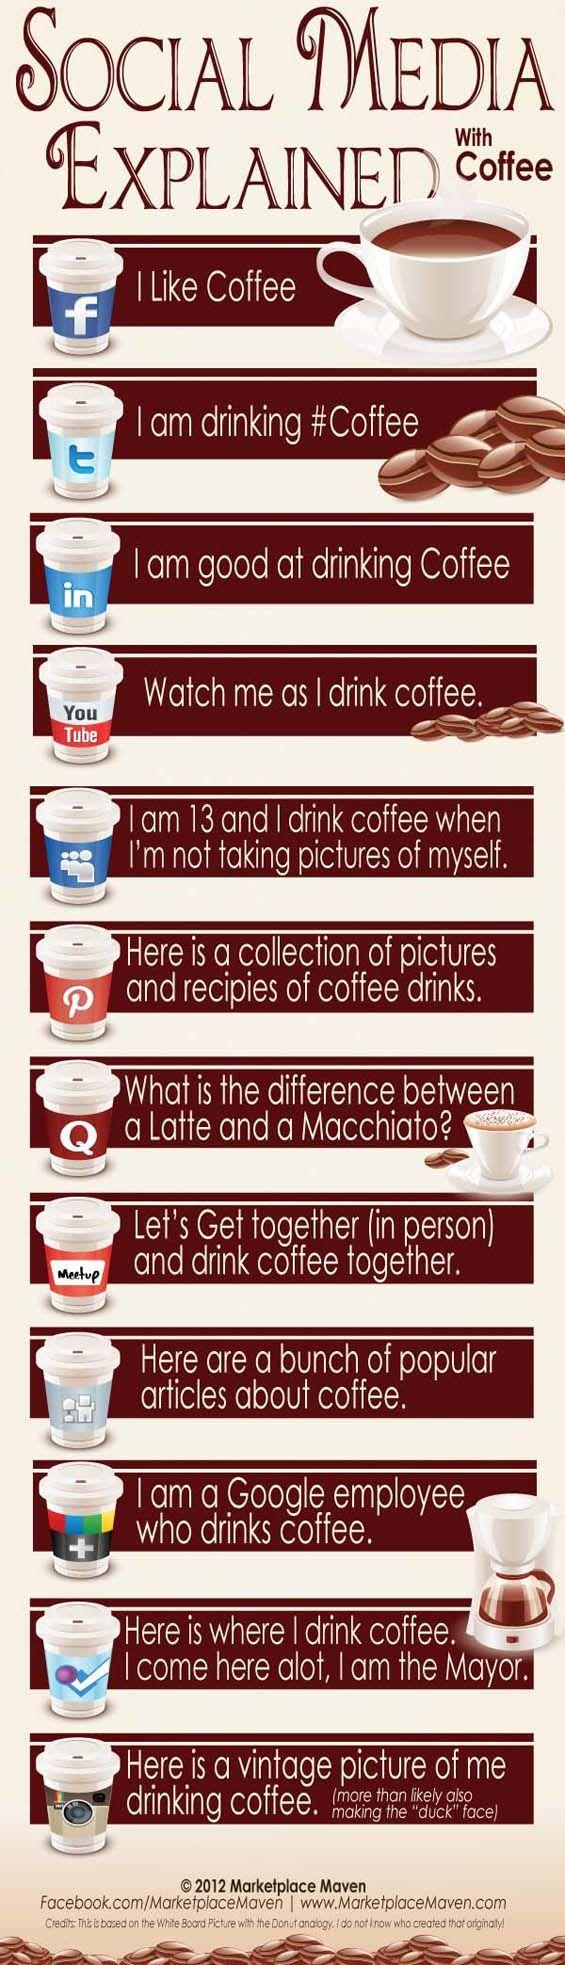 Social Media Explained with #Coffee http://www.kafepauza.mk/kafe-na-denot/socijalnite-mrezhi-objasneti-so-pomosh-na-kafeto/